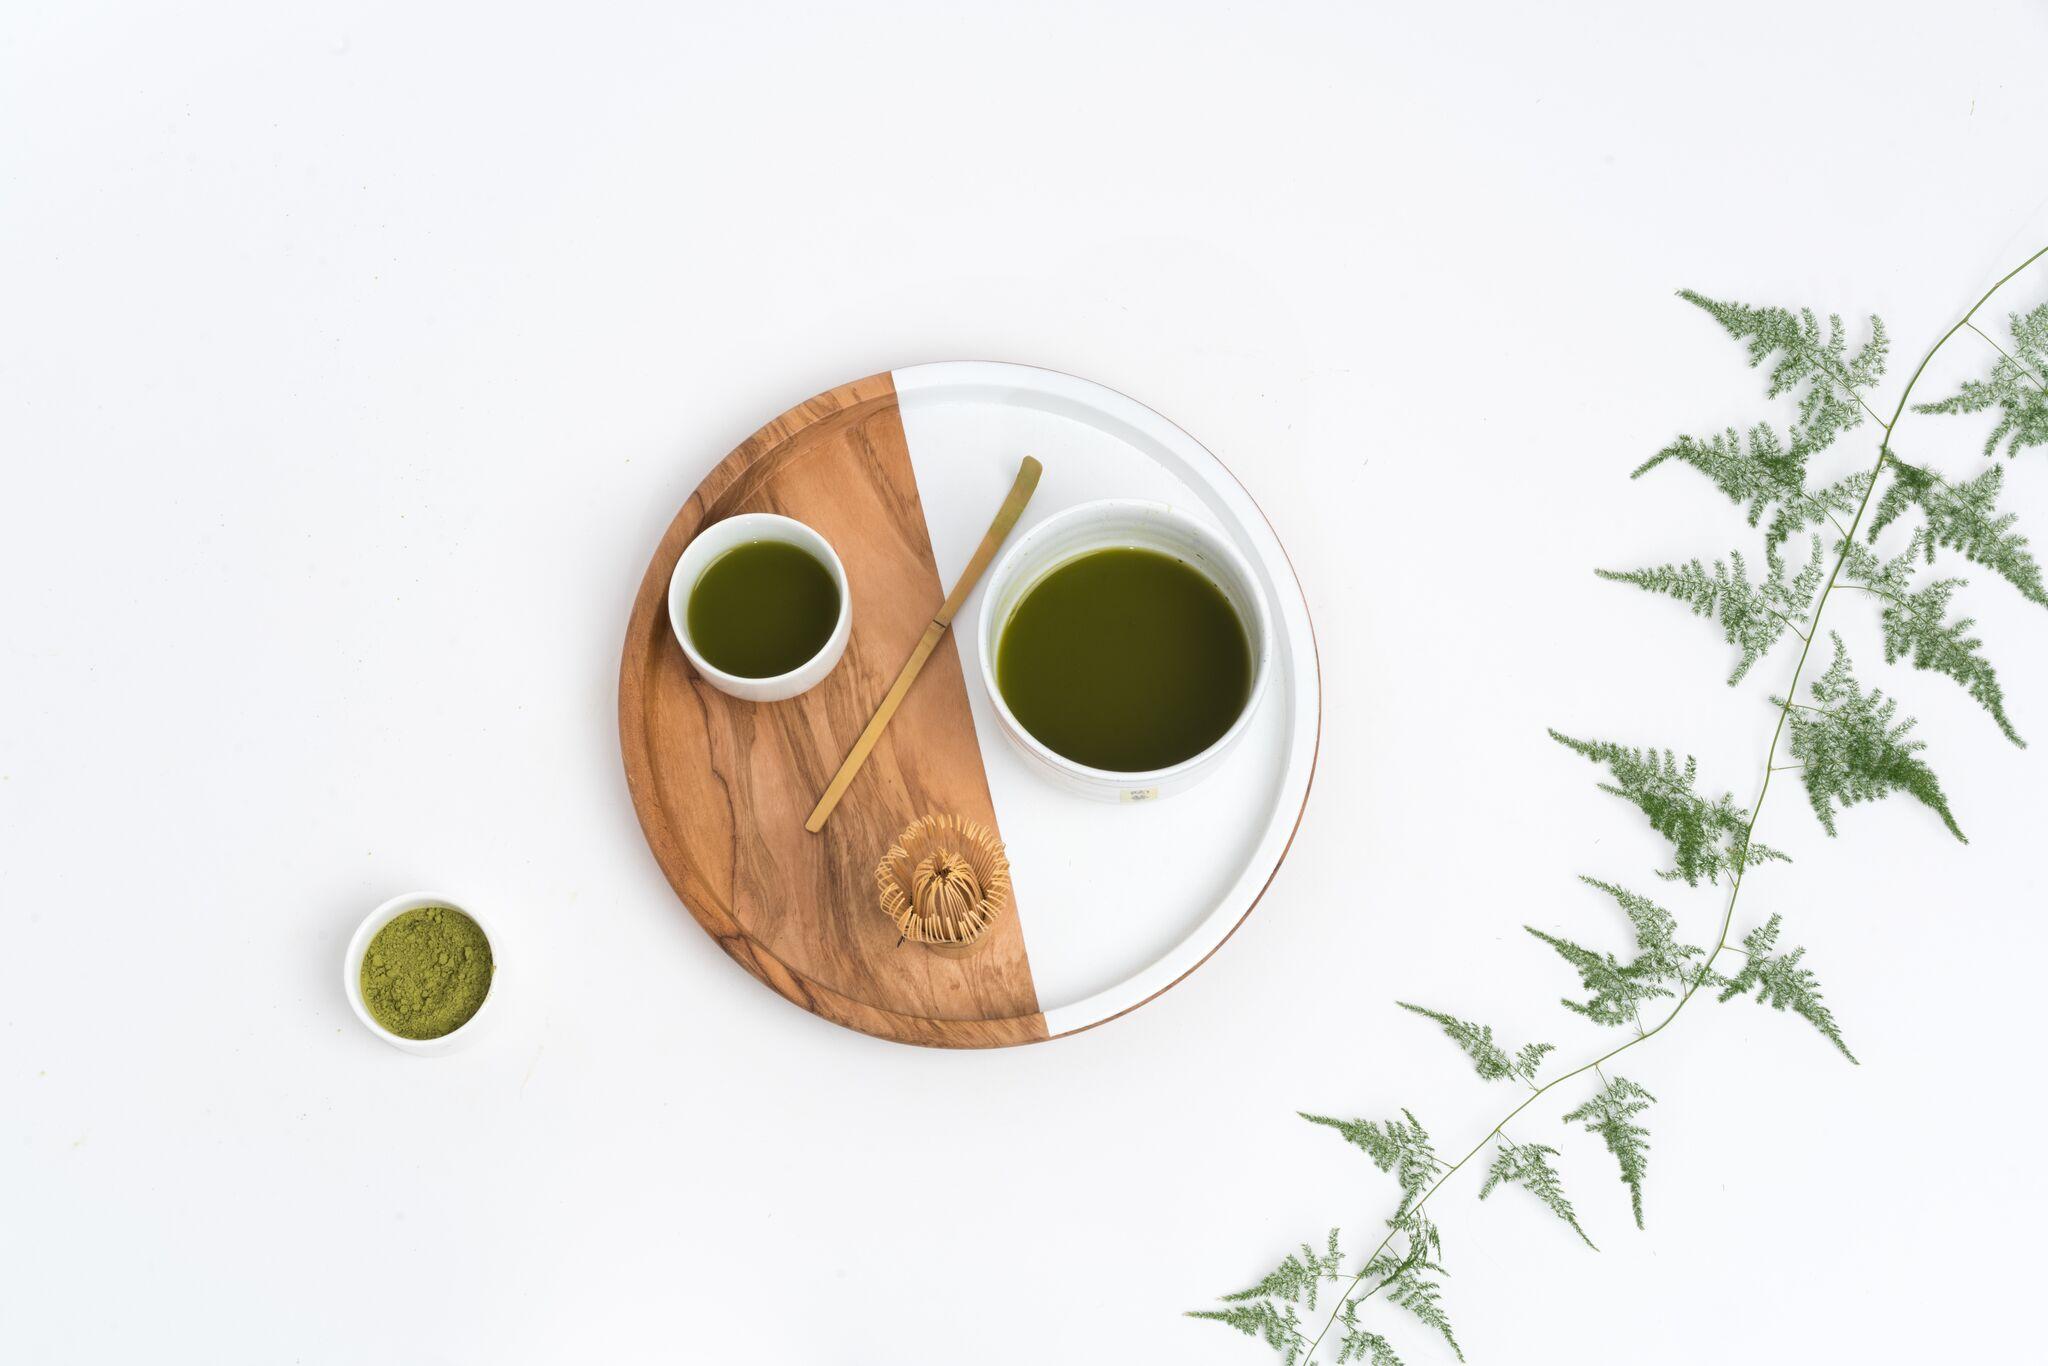 Art Of Tea Matcha Photos-31.jpg